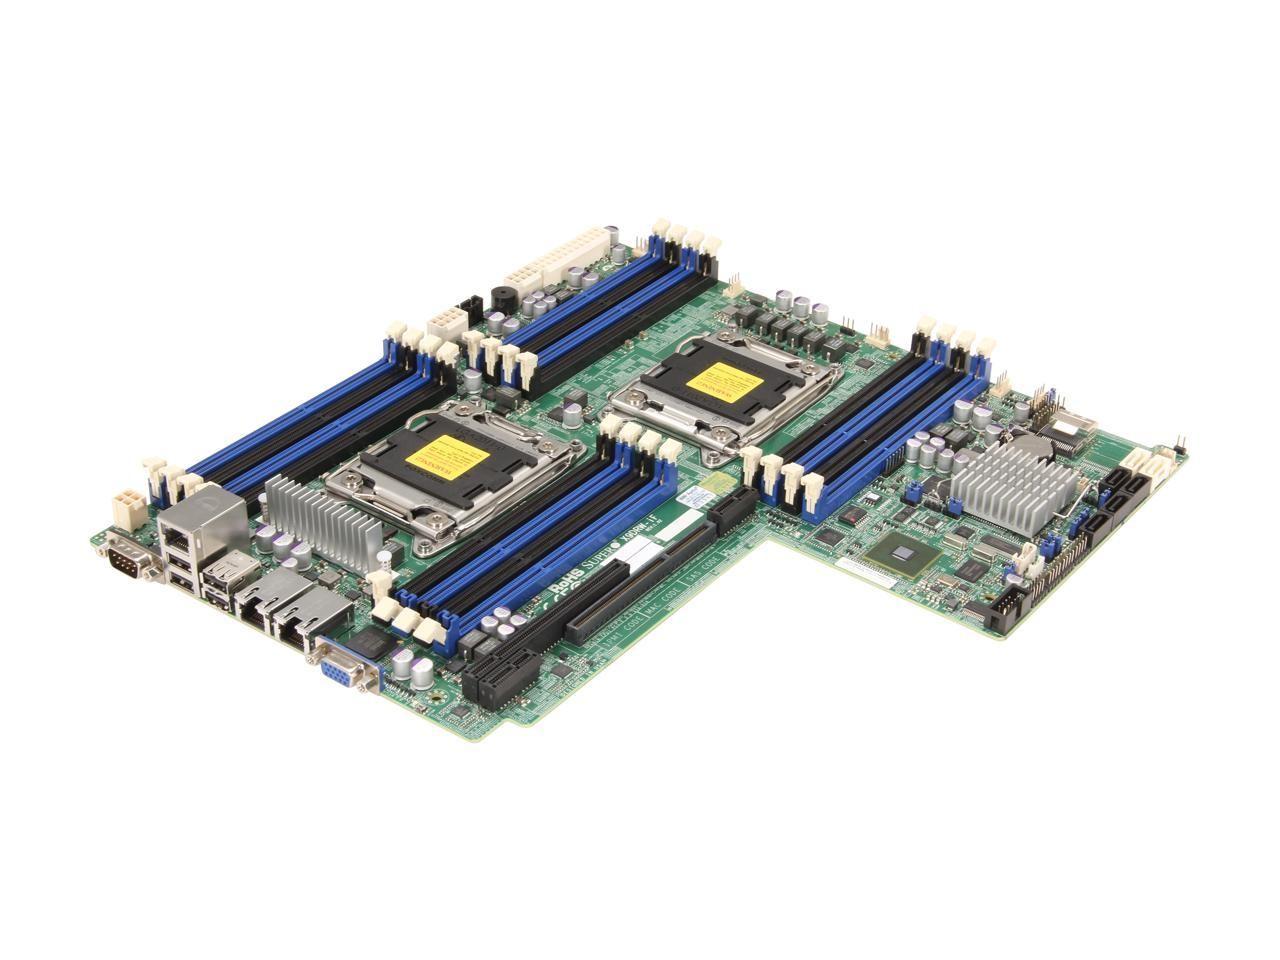 SuperMicro X9DRW-IF Intel C602 Chipset DDR3 Dual Socket LGA 2011 MBD-X9DRW-IF-B Server Motherboard